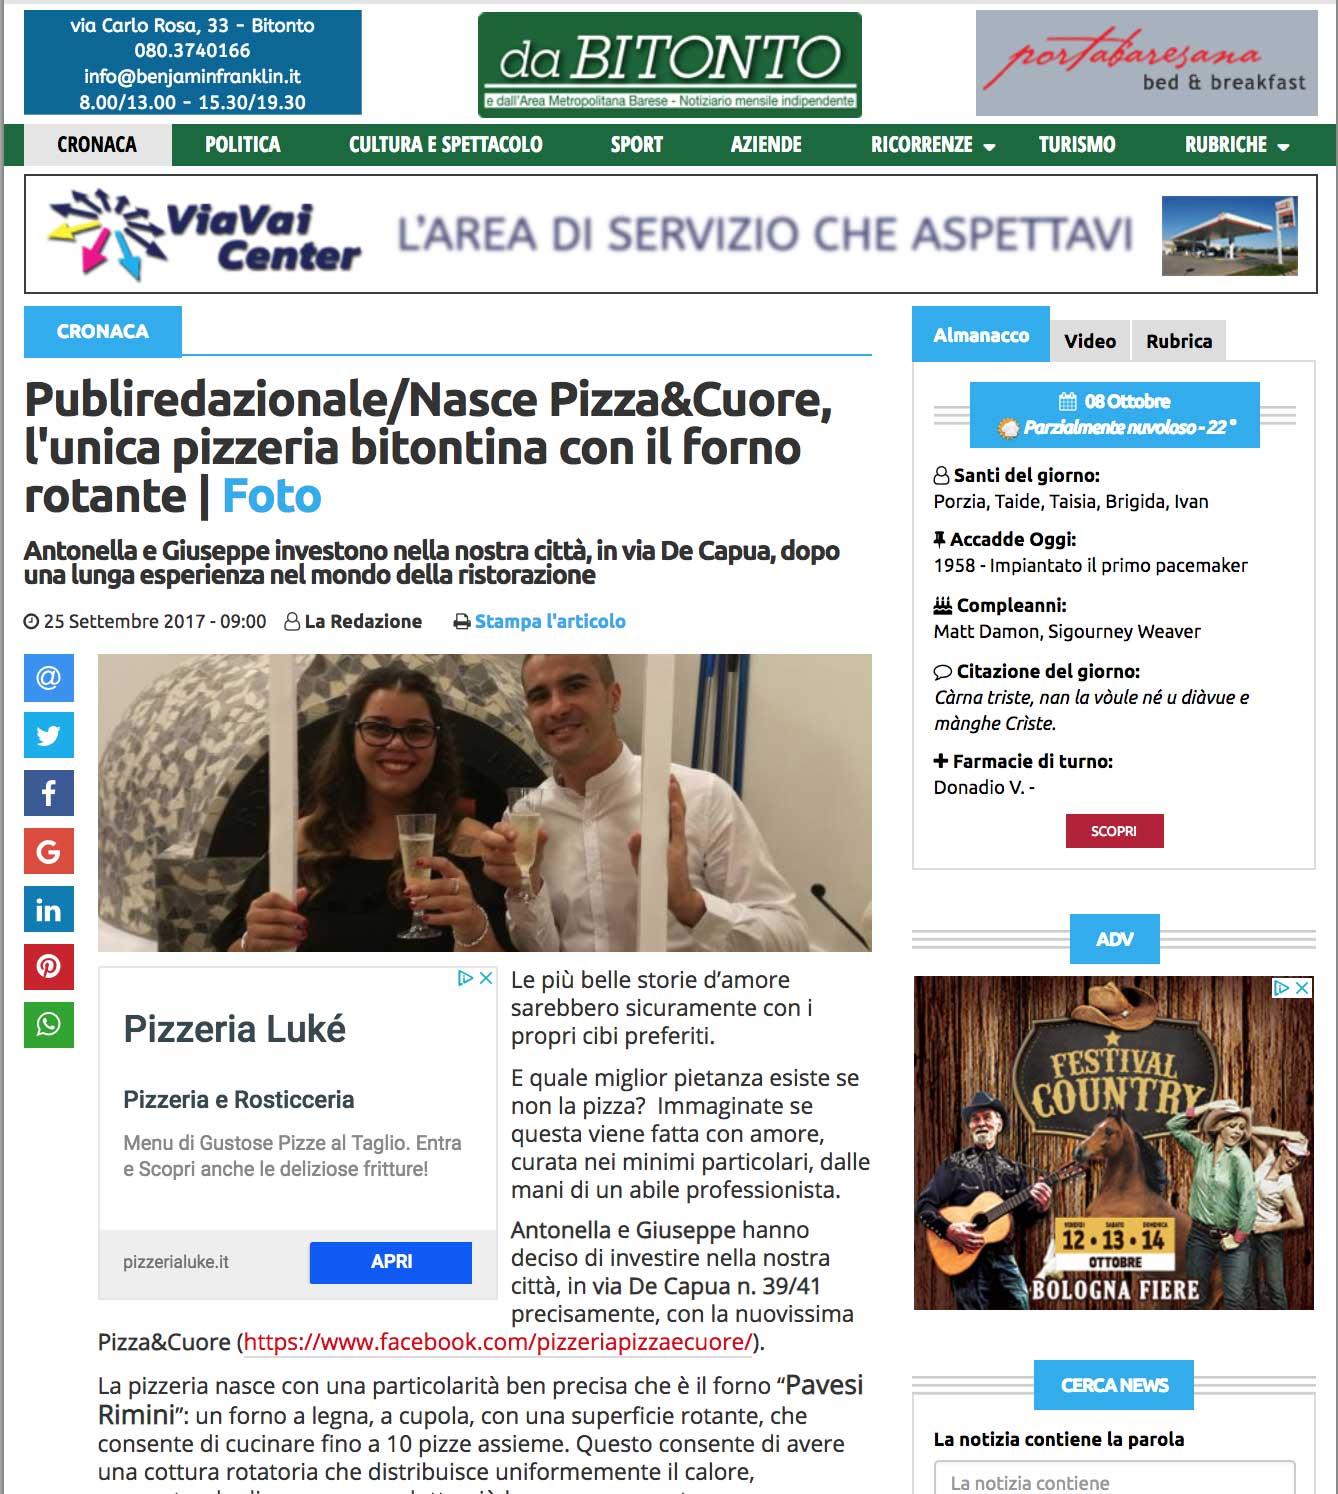 Forni Pavesi Rimini forno rotante